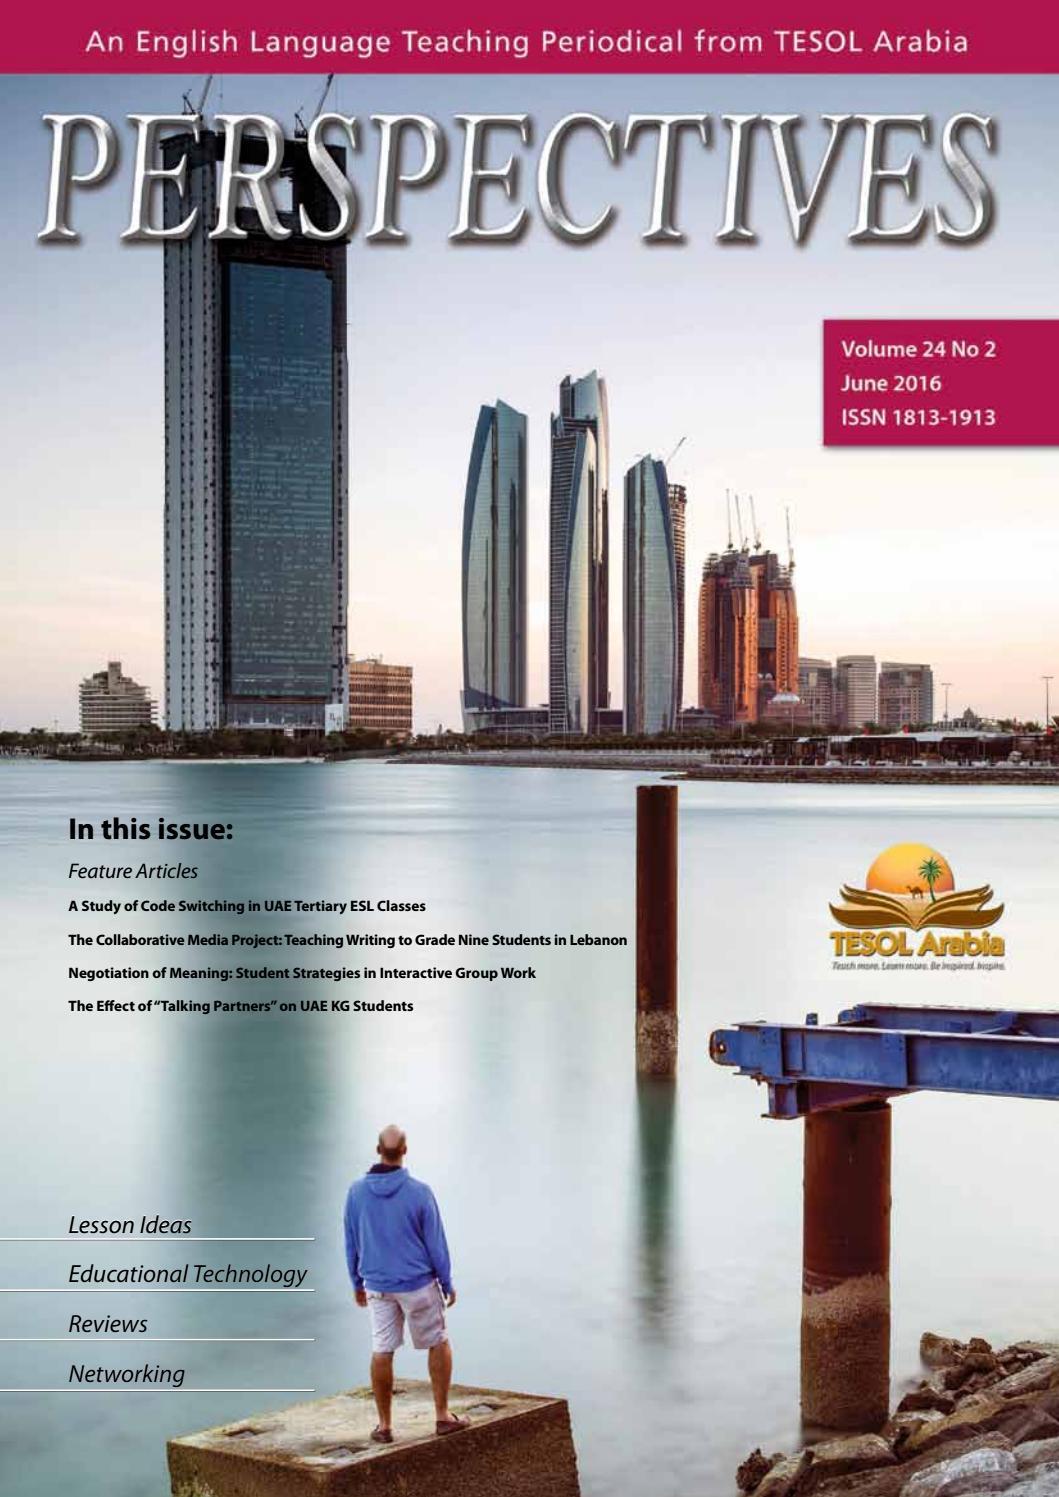 jun 2016 by tesol arabia perspectives issuu